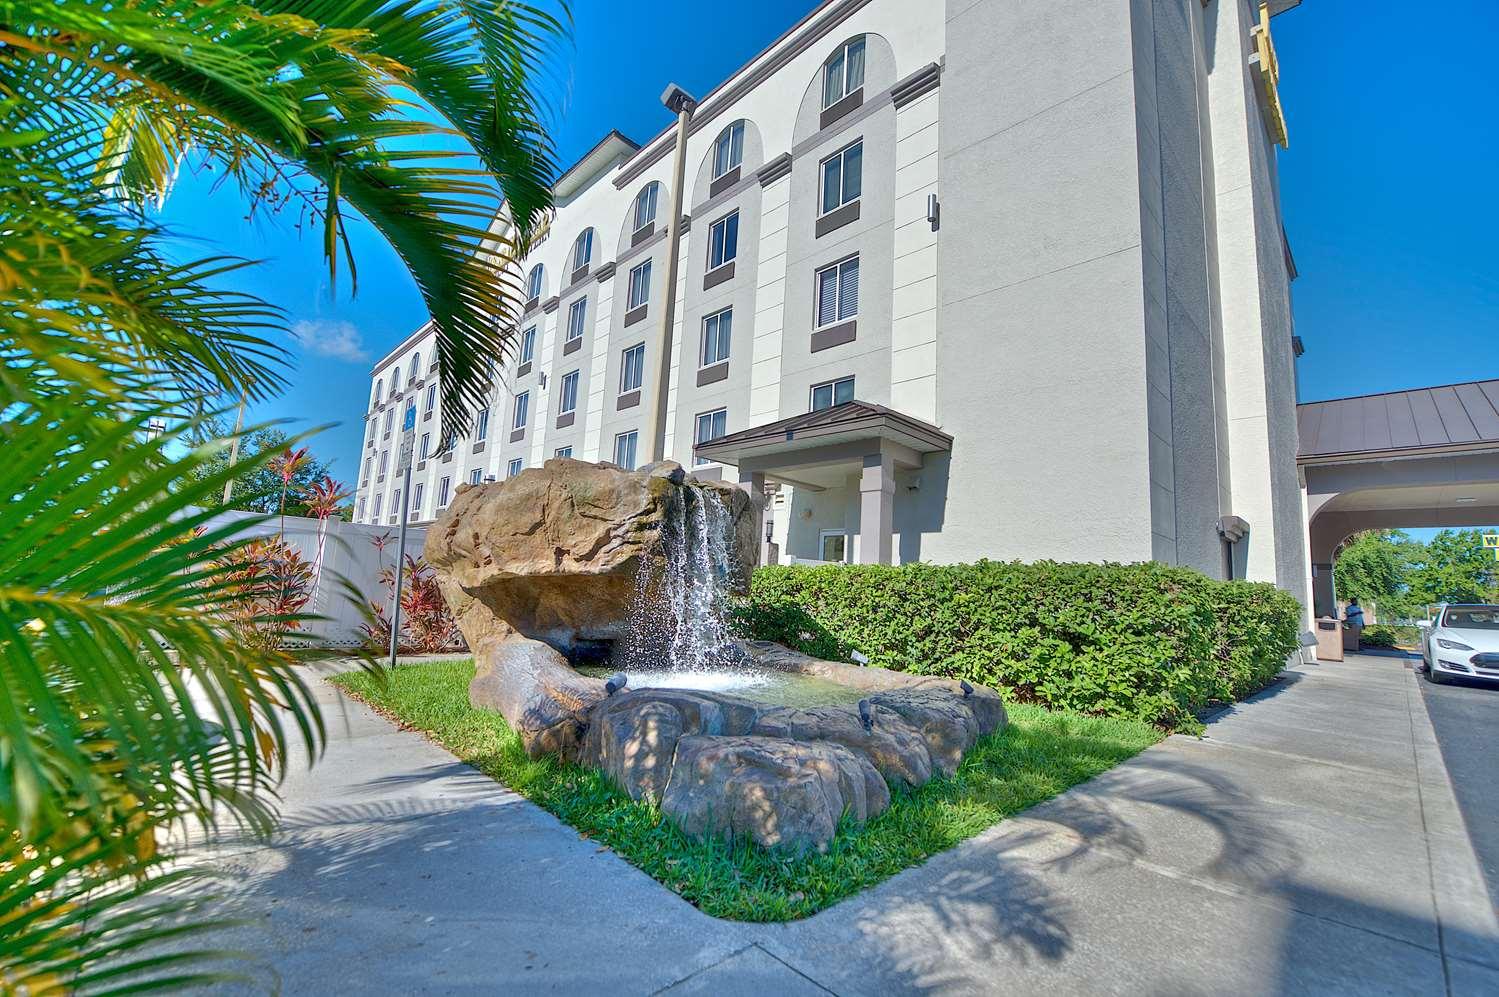 proam - Best Western Orlando Airport Inn & Suites